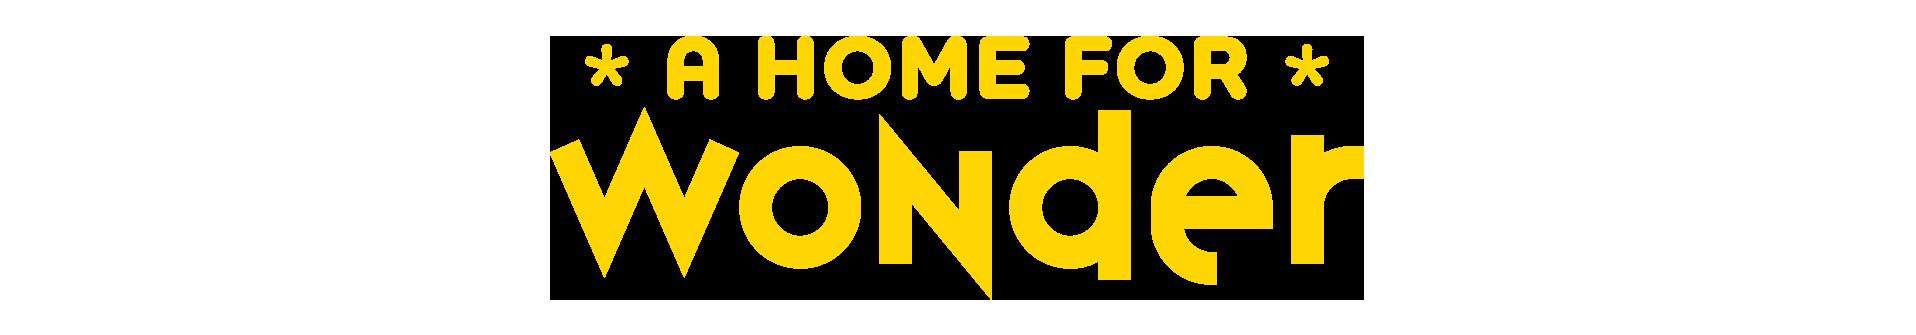 wonder_slogan_web.png